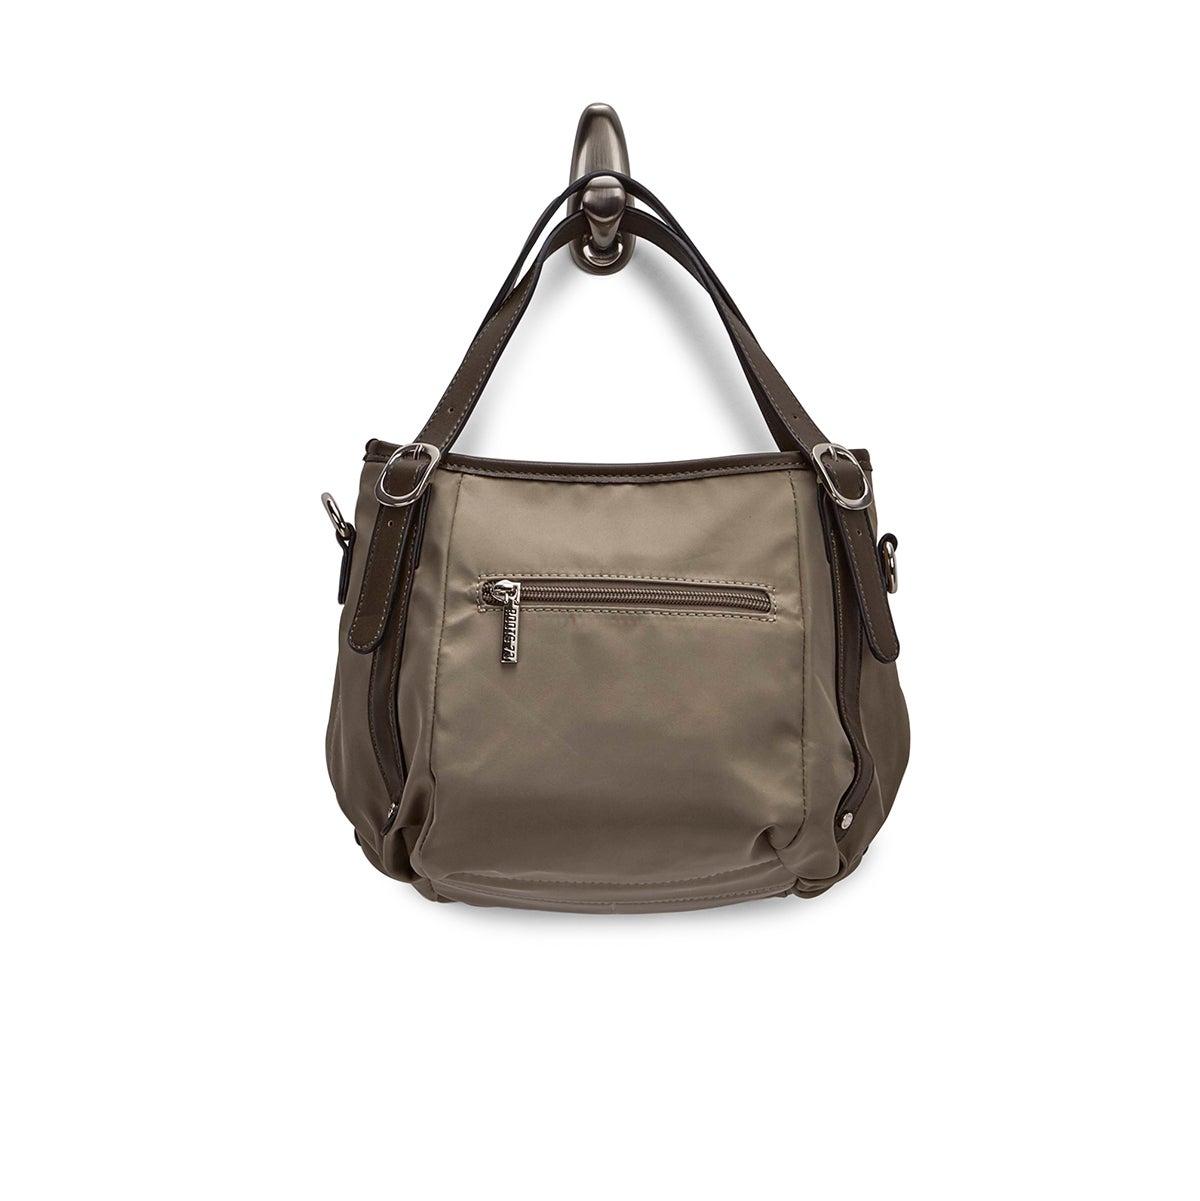 Lds Roots73 khaki small satchel